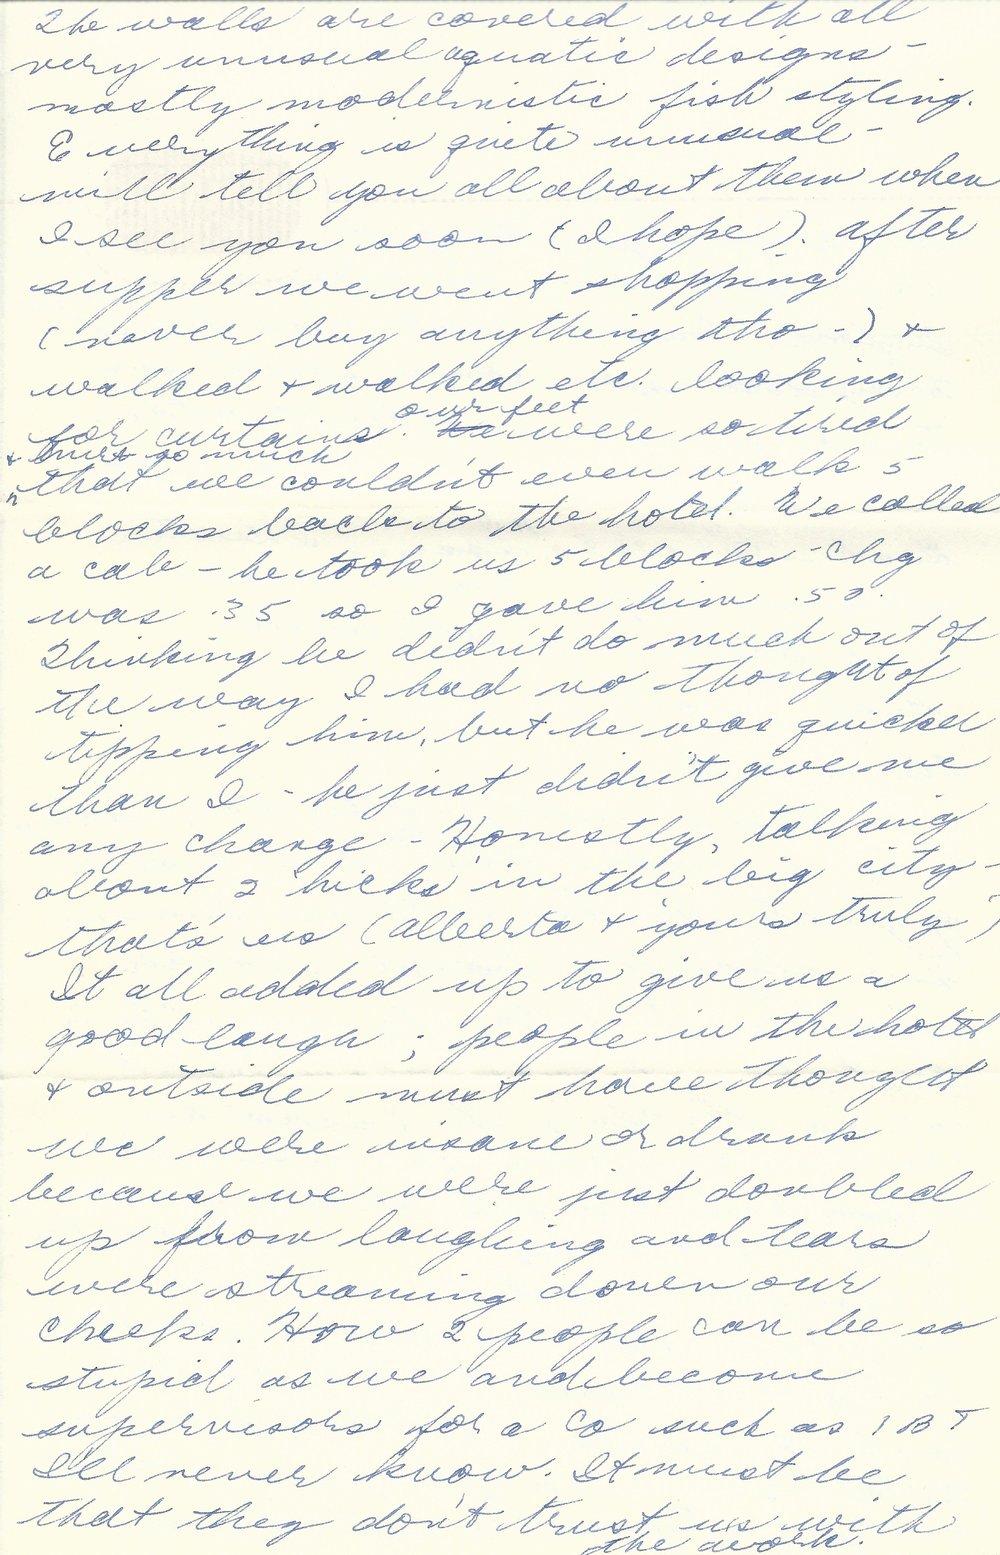 7. Oct. 9-21, 1952 (Oma)_Page_15.jpg